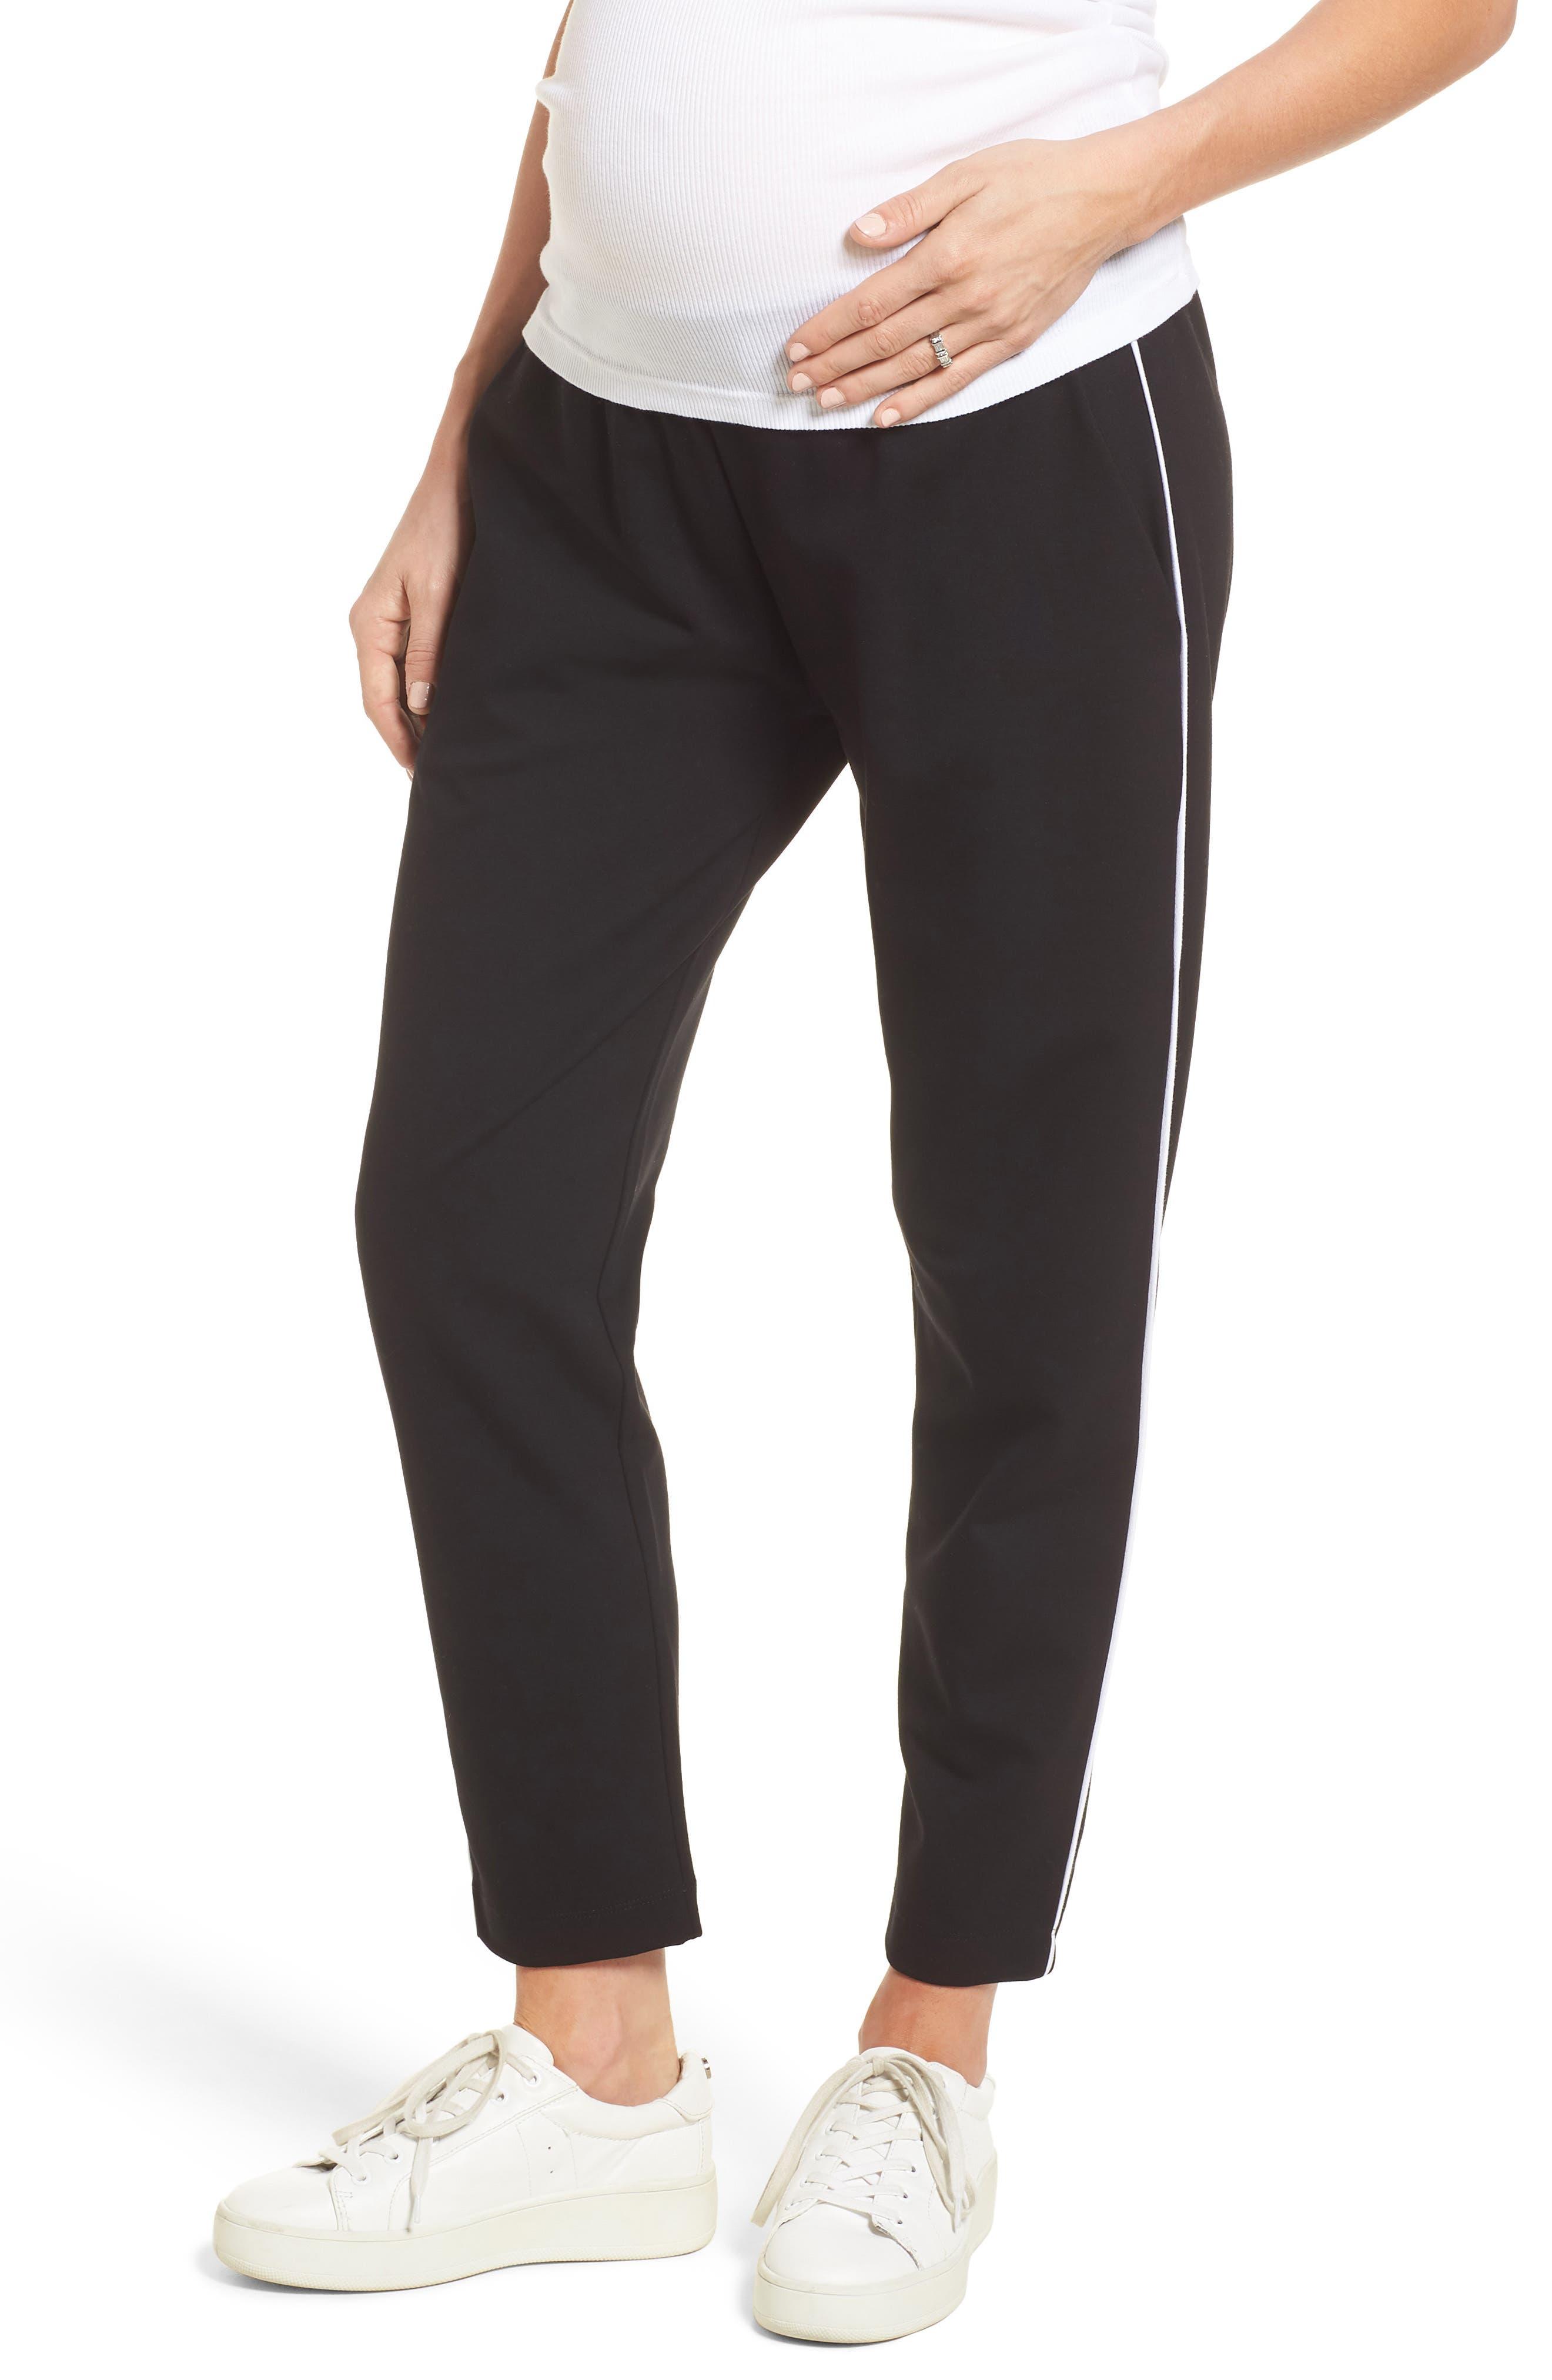 Maxine Contrast Maternity Pants,                         Main,                         color, Caviar Black